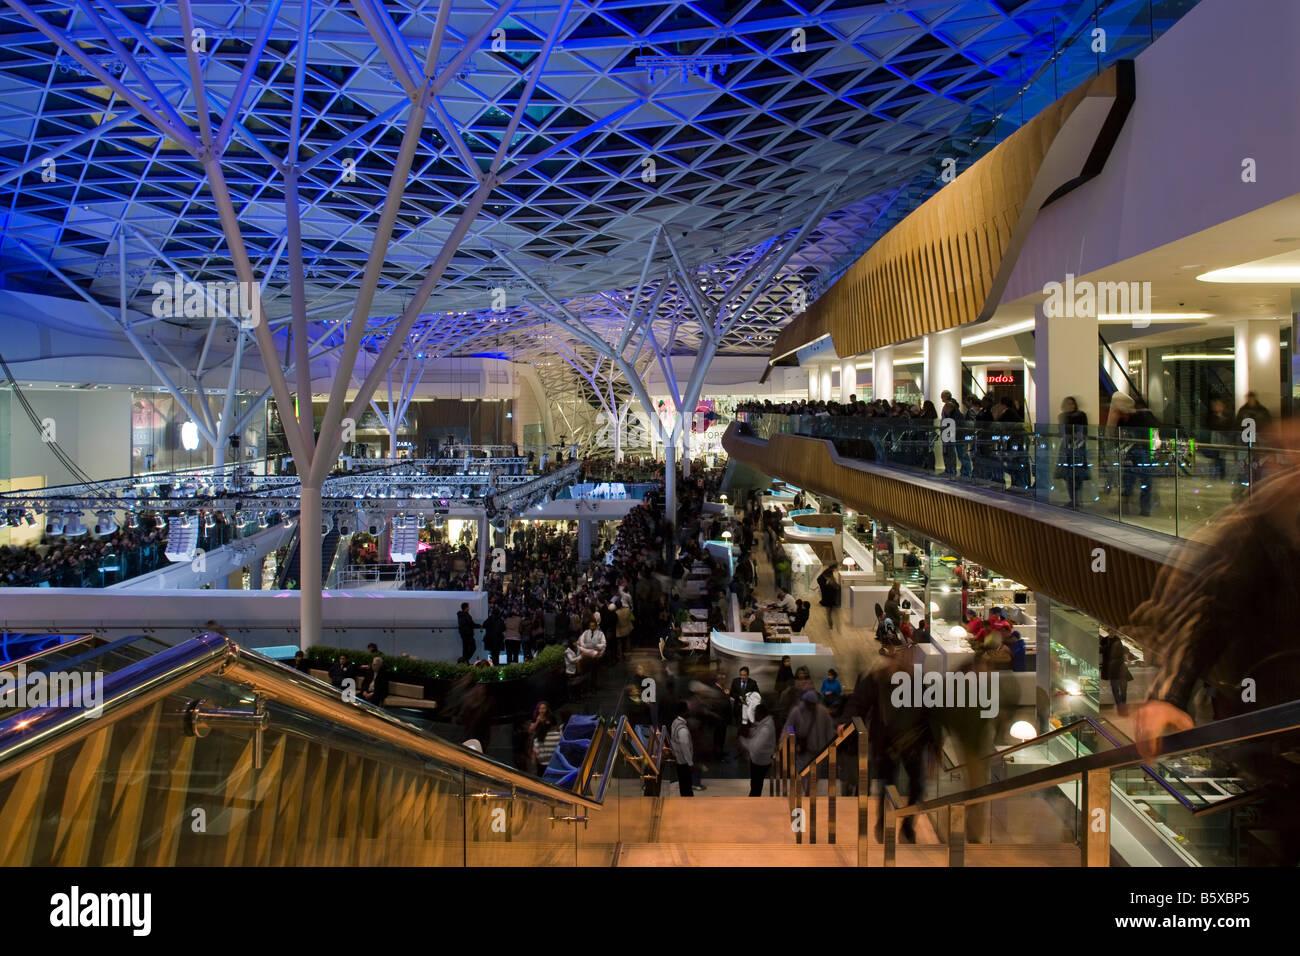 Eat Gallery, Westfield Shopping Centre, White City, Shepherds Bush, London. - Stock Image